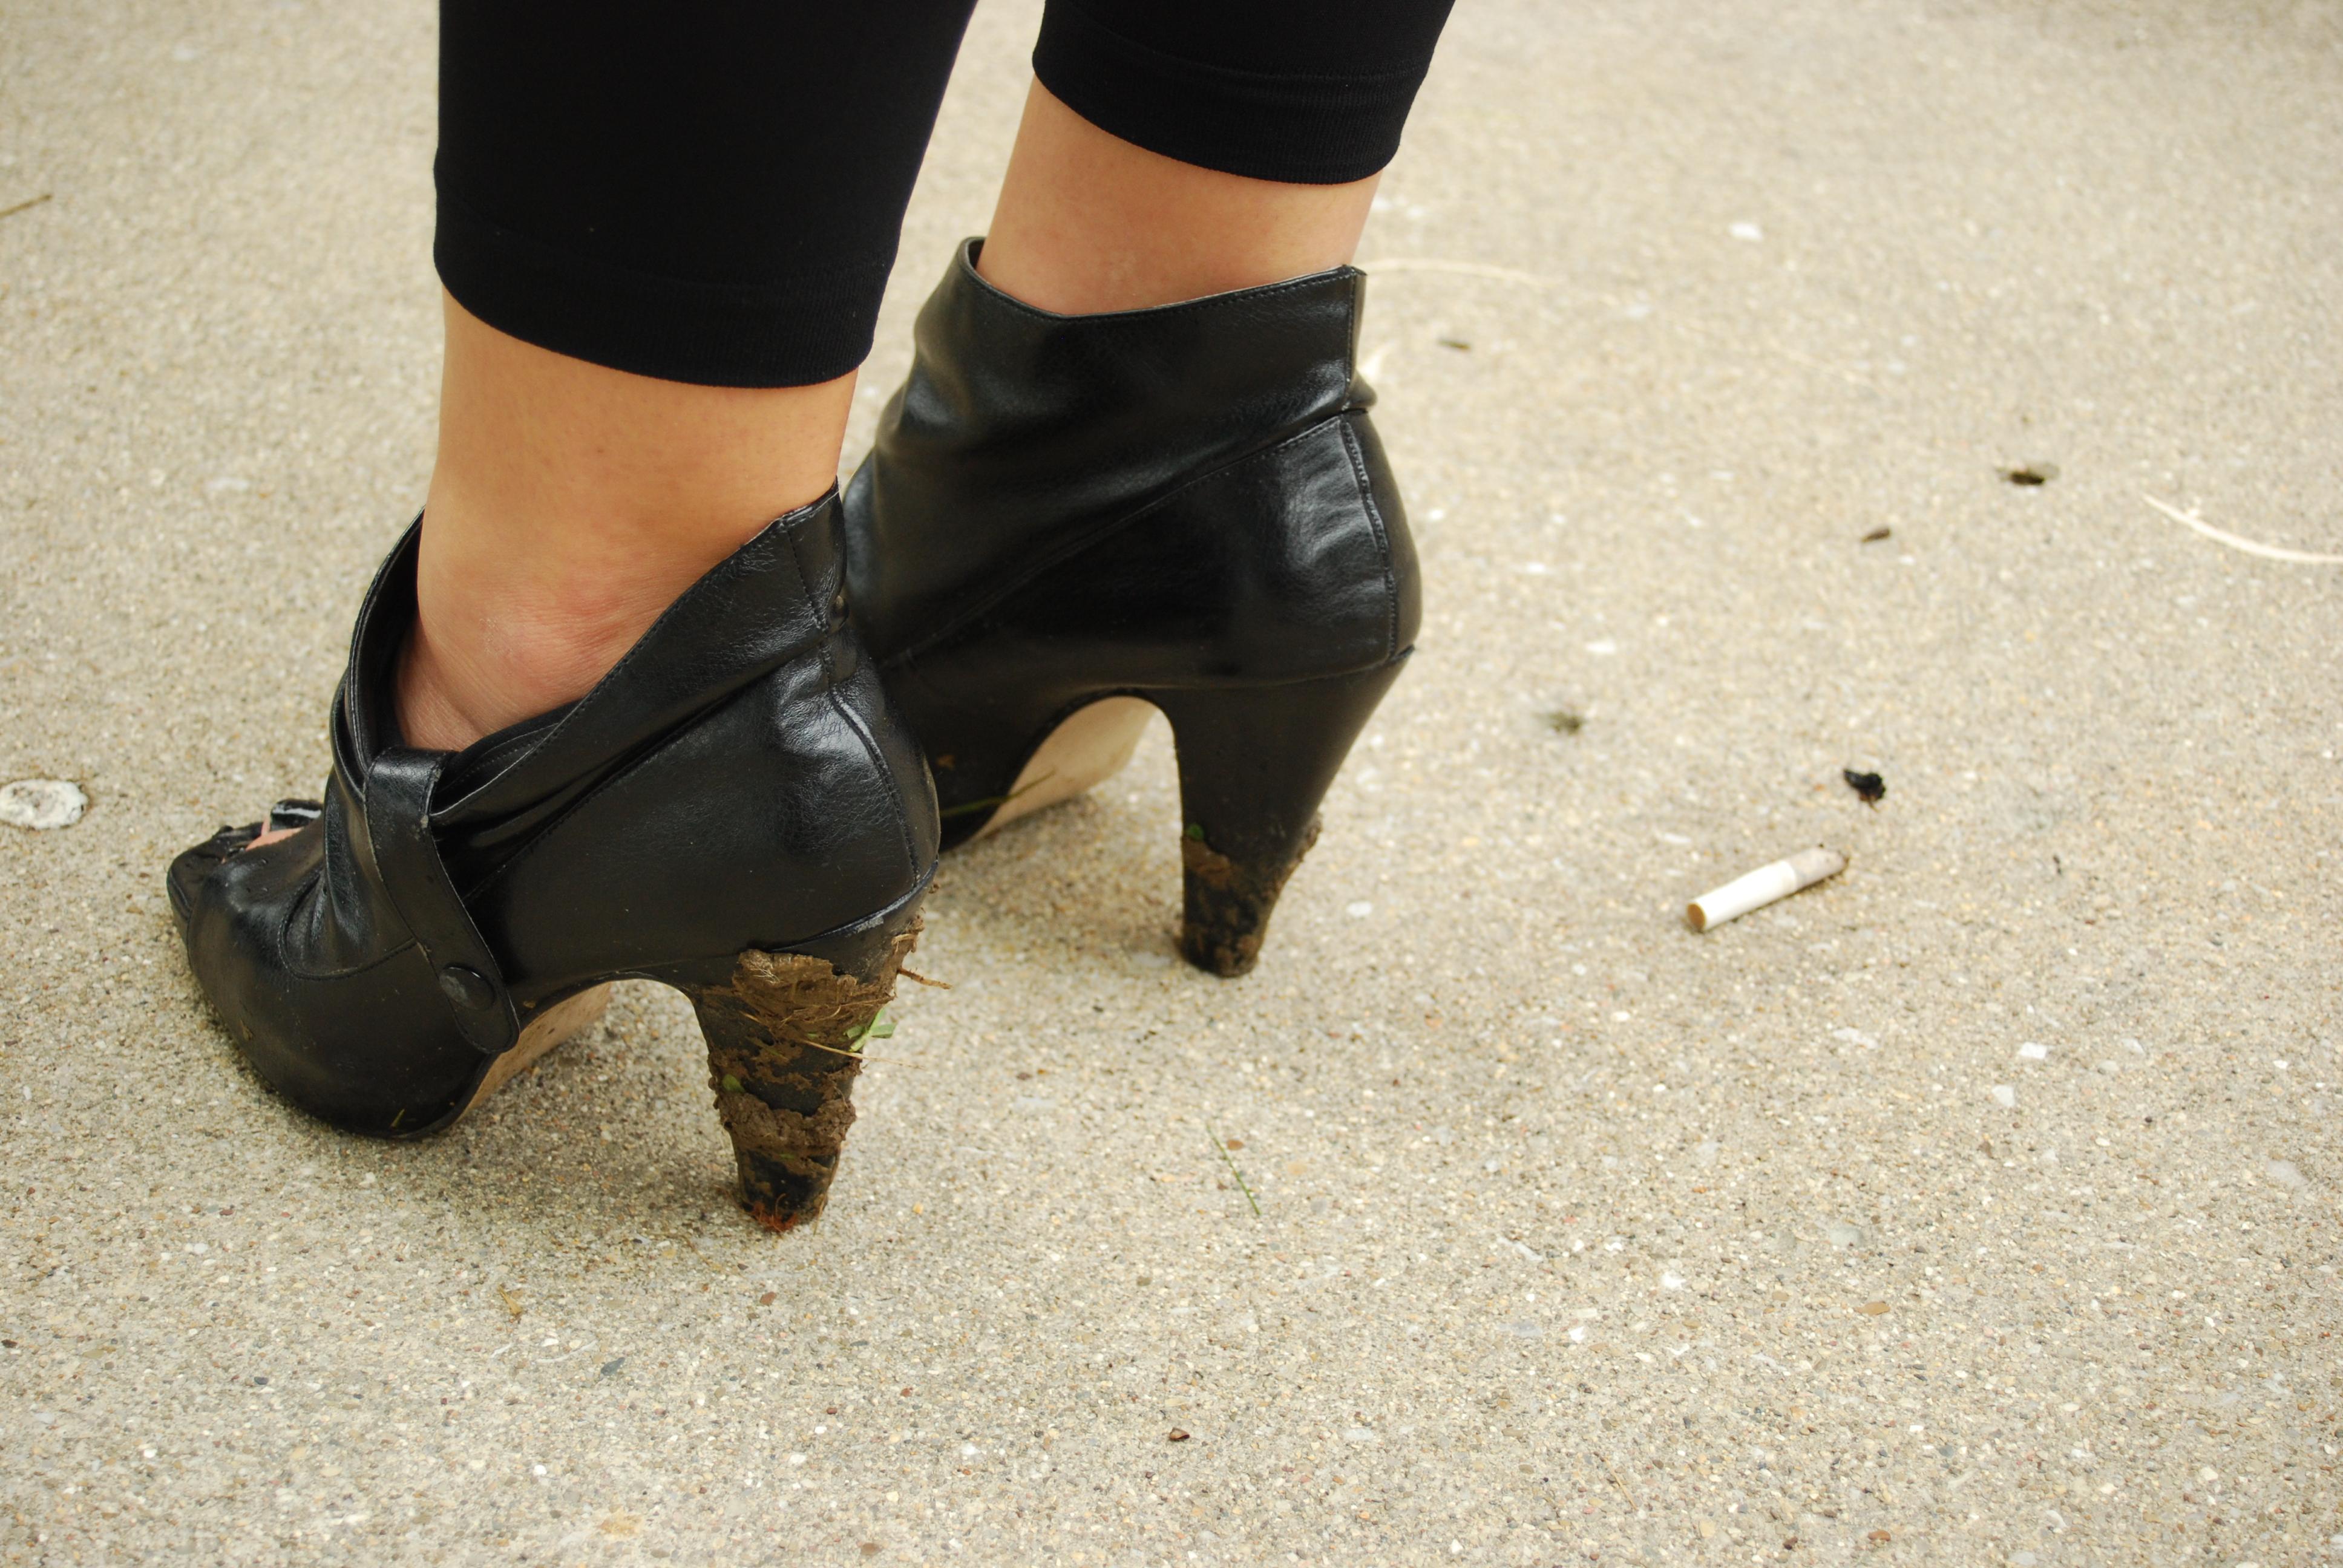 Девушки в обуви ходят по рабам фото рот